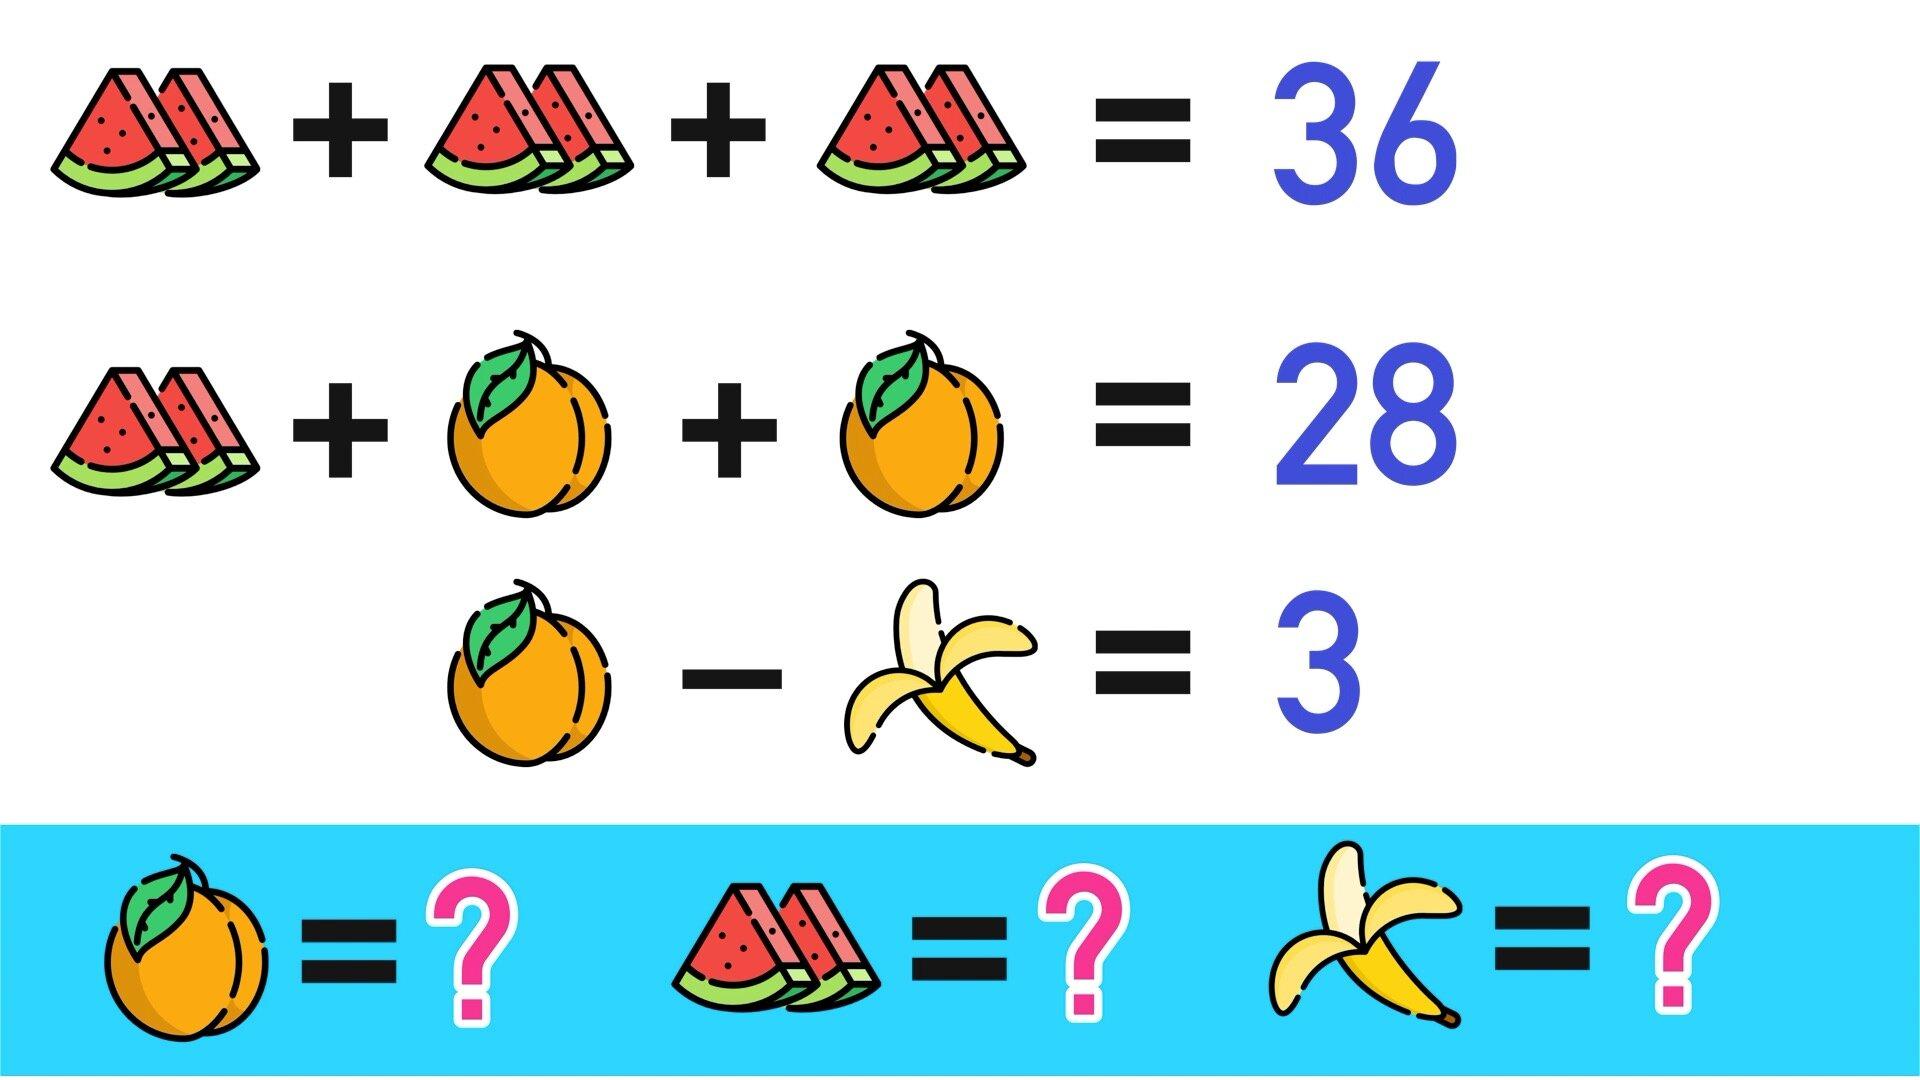 hight resolution of 7 Super Fun Math Logic Puzzles for Kids! — Mashup Math